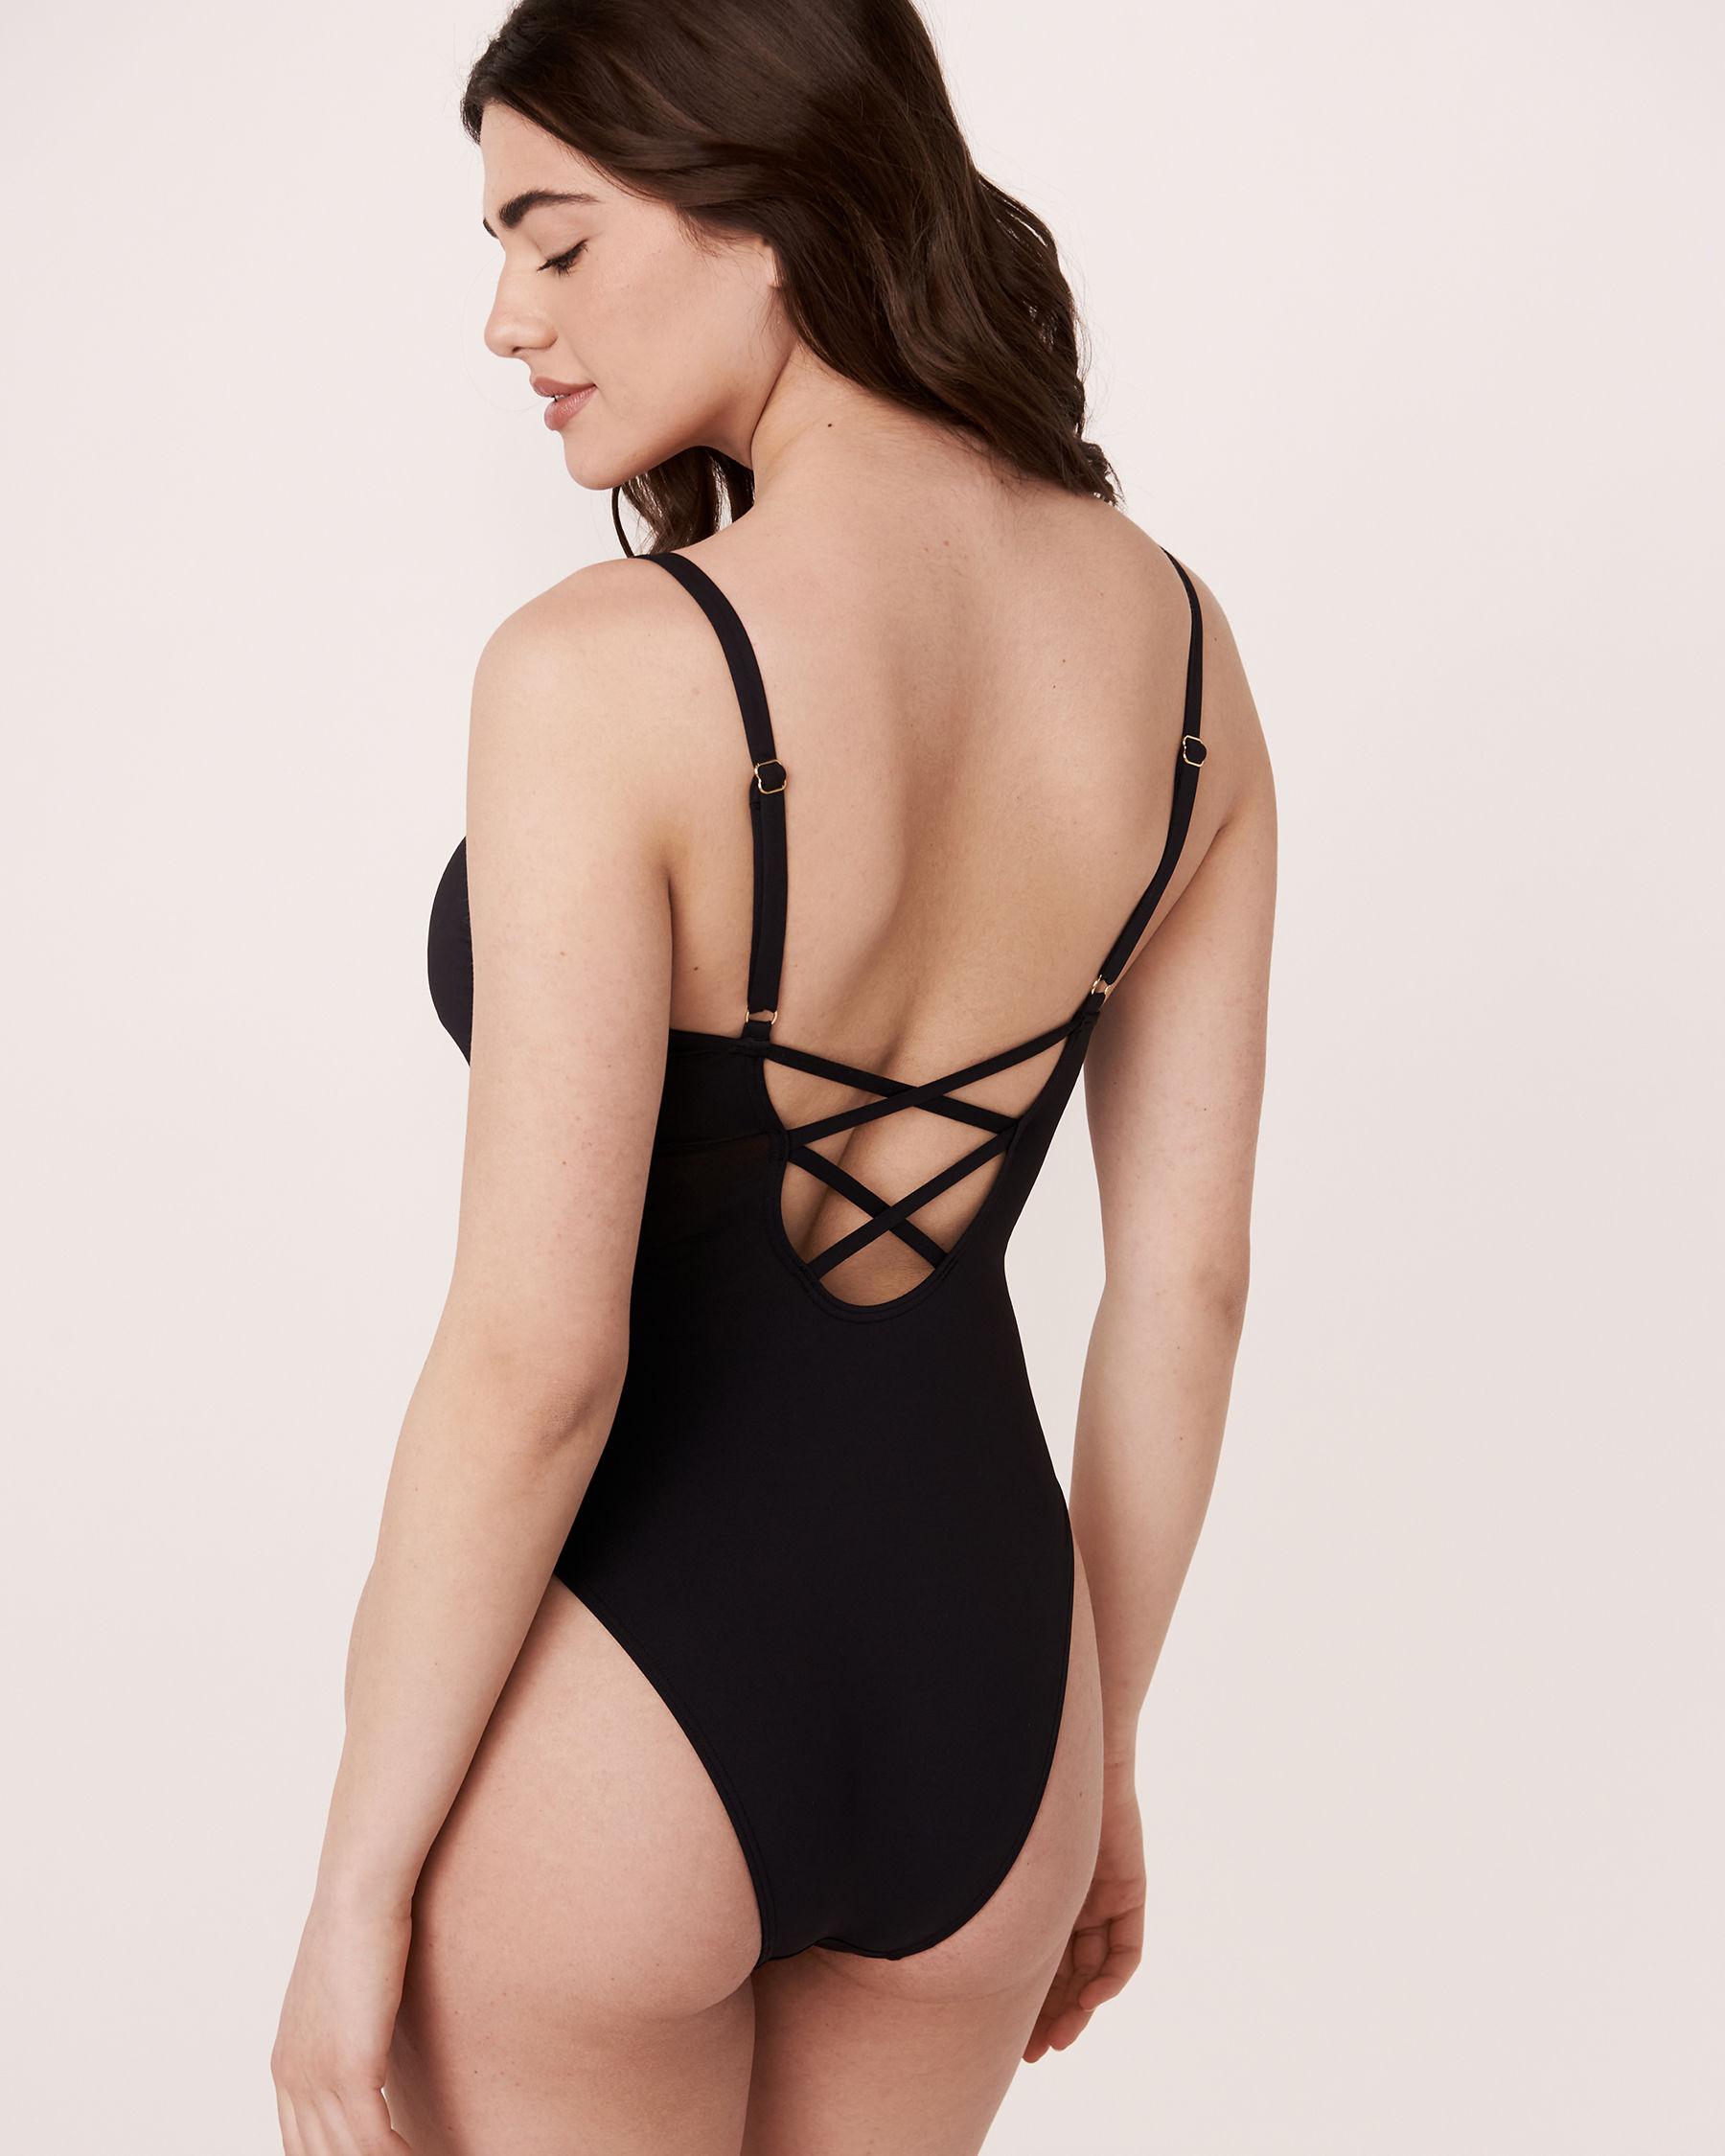 AQUAROSE LEILA Cross Back One-piece Swimsuit Black 70400015 - View3